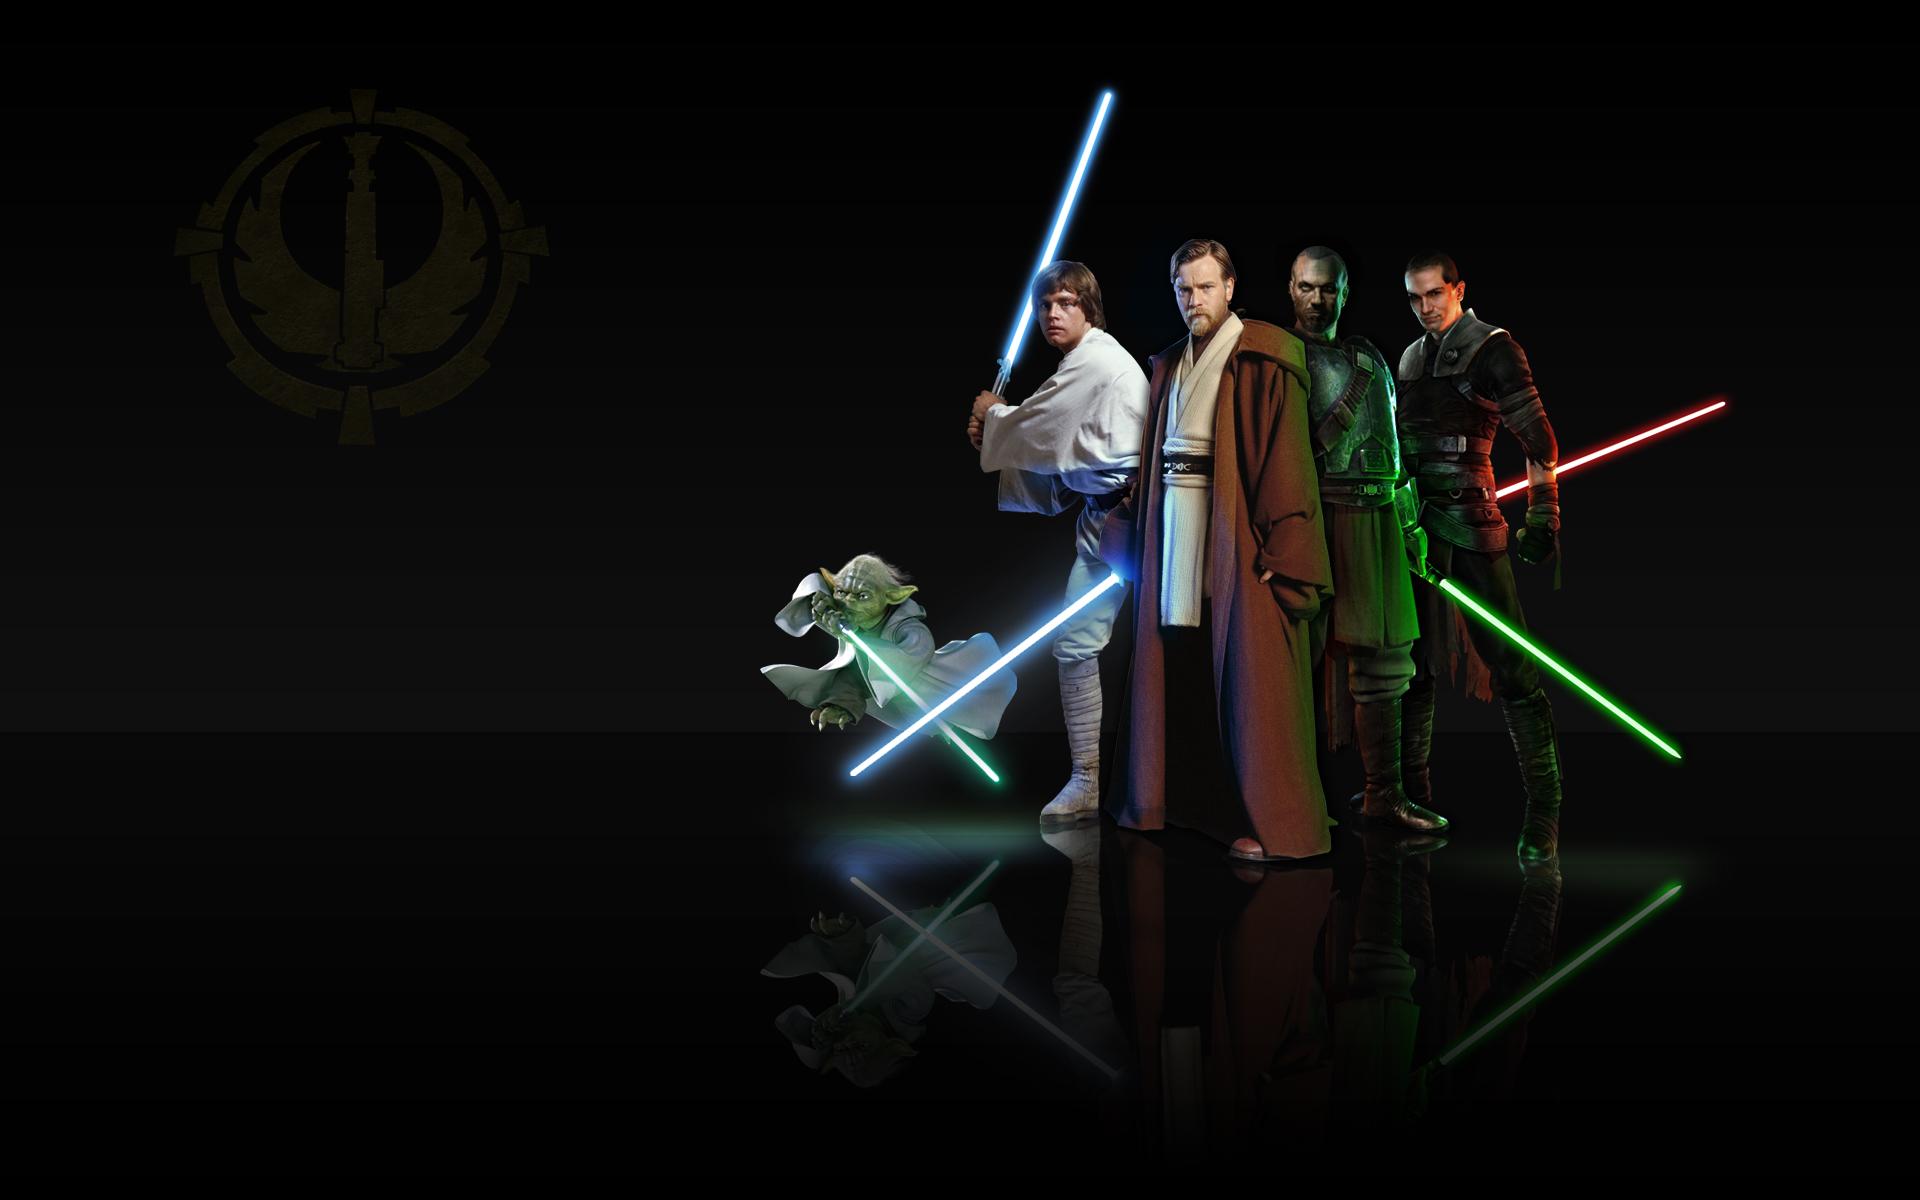 Star Wars Hd Wallpaper   Desktop Backgrounds 1920x1200